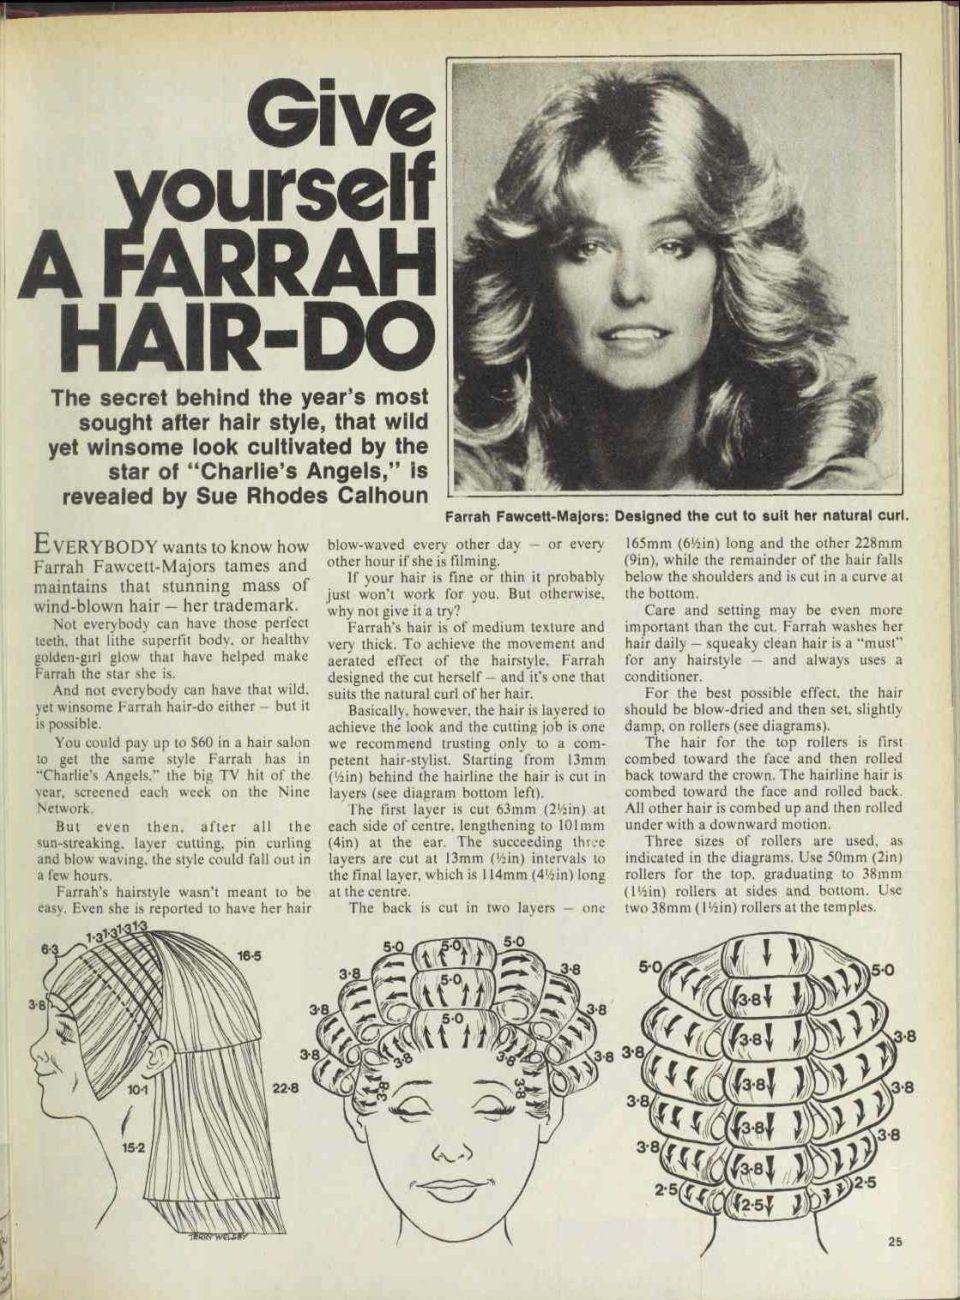 pin by pete on vintage hair howtos | pinterest | roller ... farrah fawcett haircut diagram #3